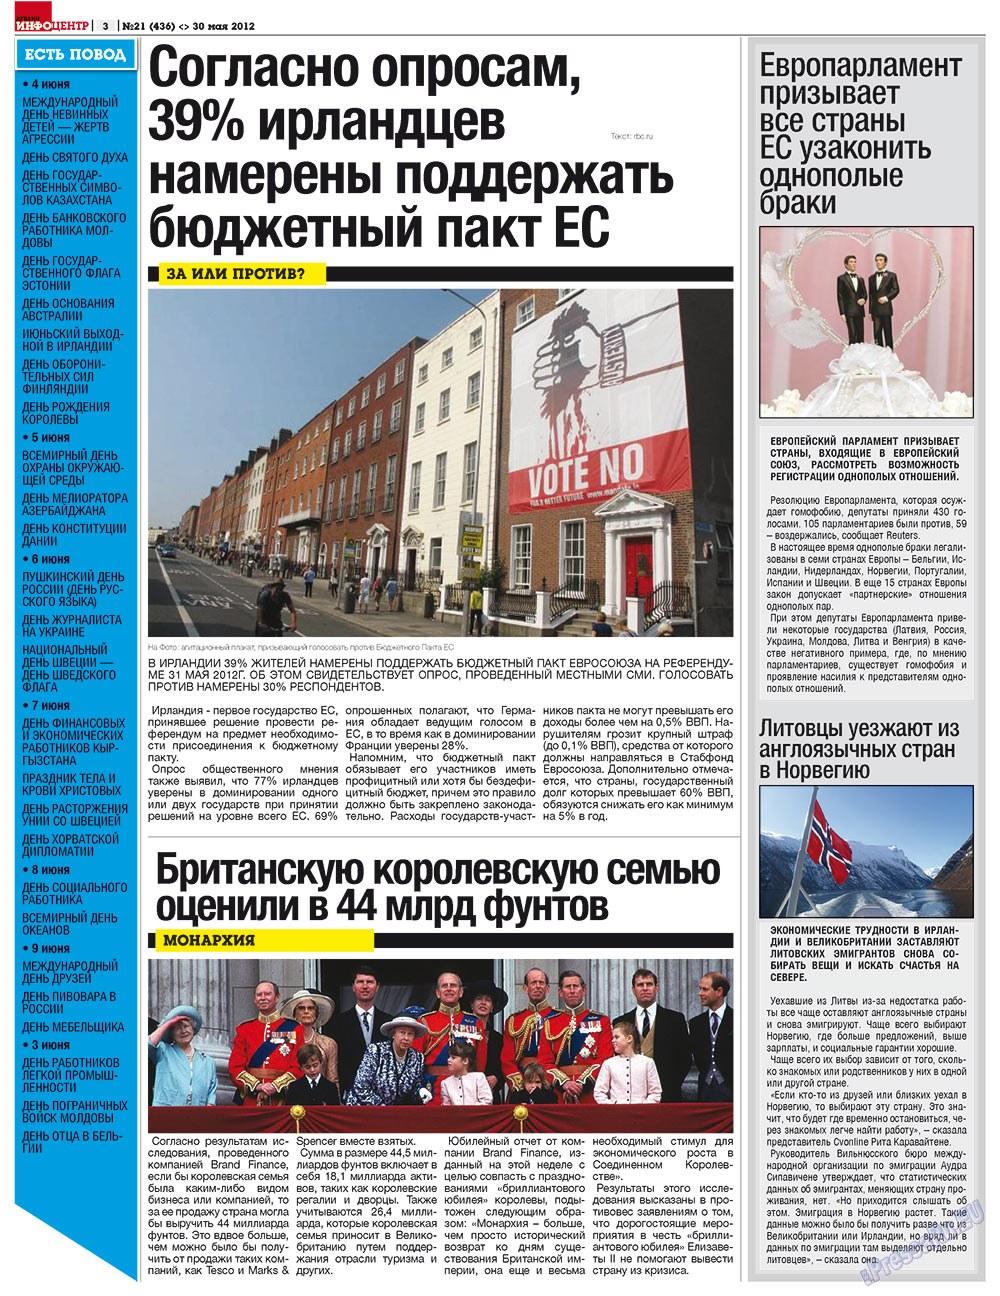 Дублин инфоцентр (газета). 2012 год, номер 21, стр. 3